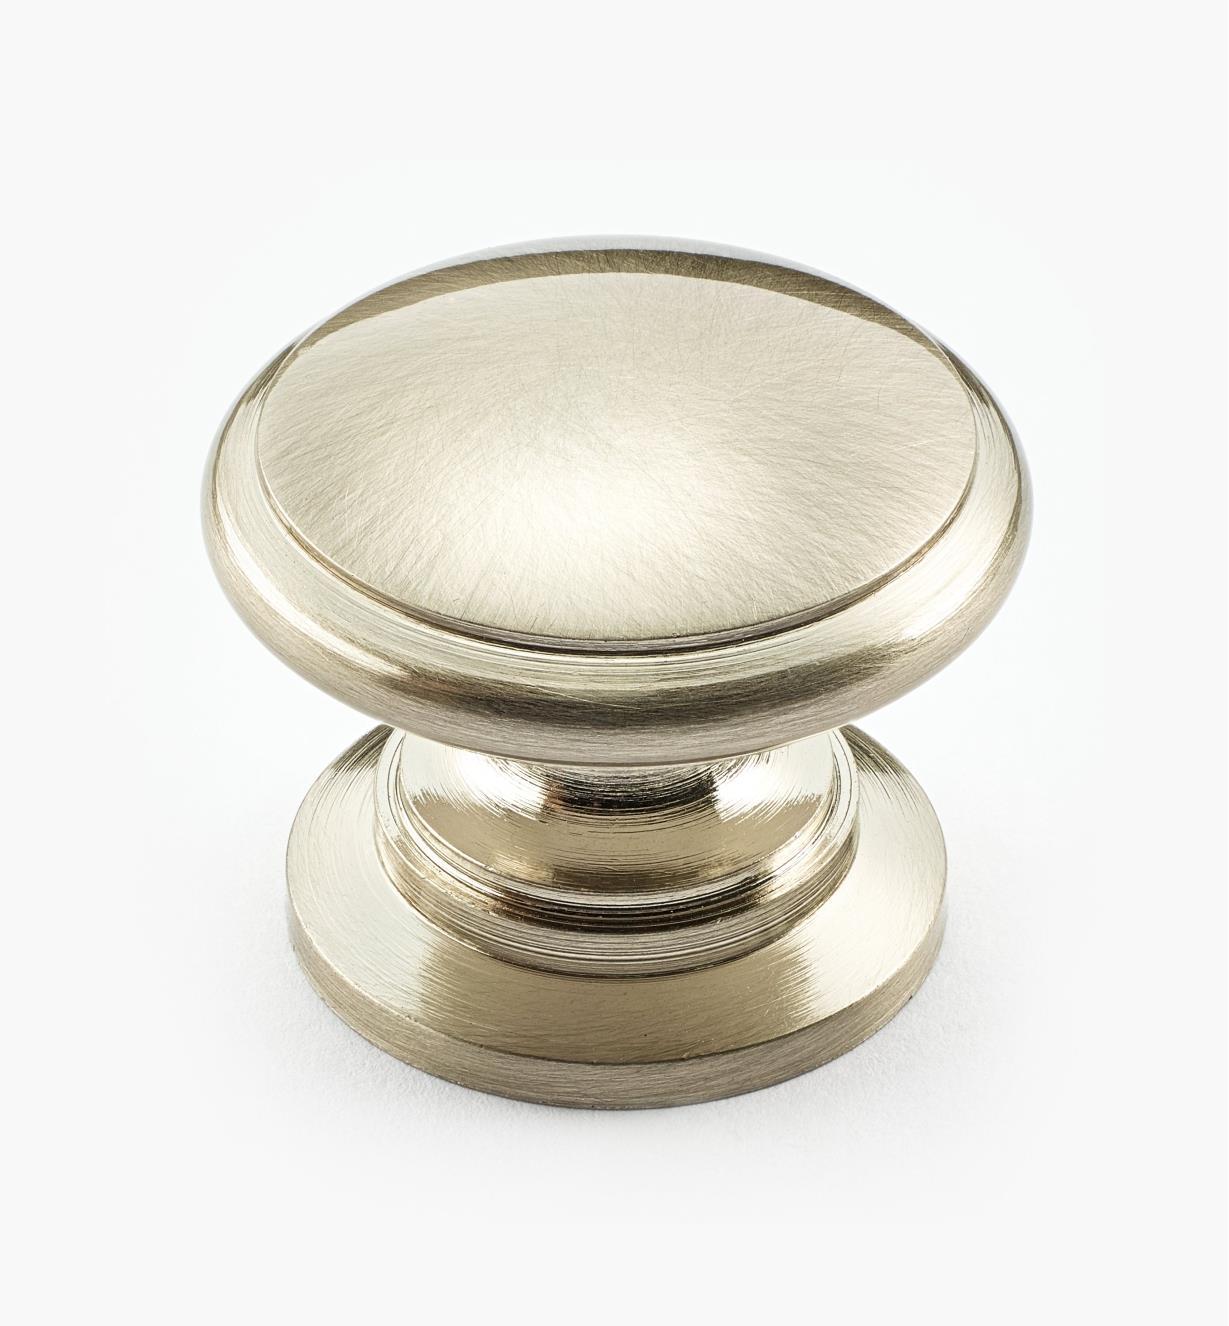 01W3830 - Bouton d'armoire en laiton, nickel brossé, 11/4pox1po